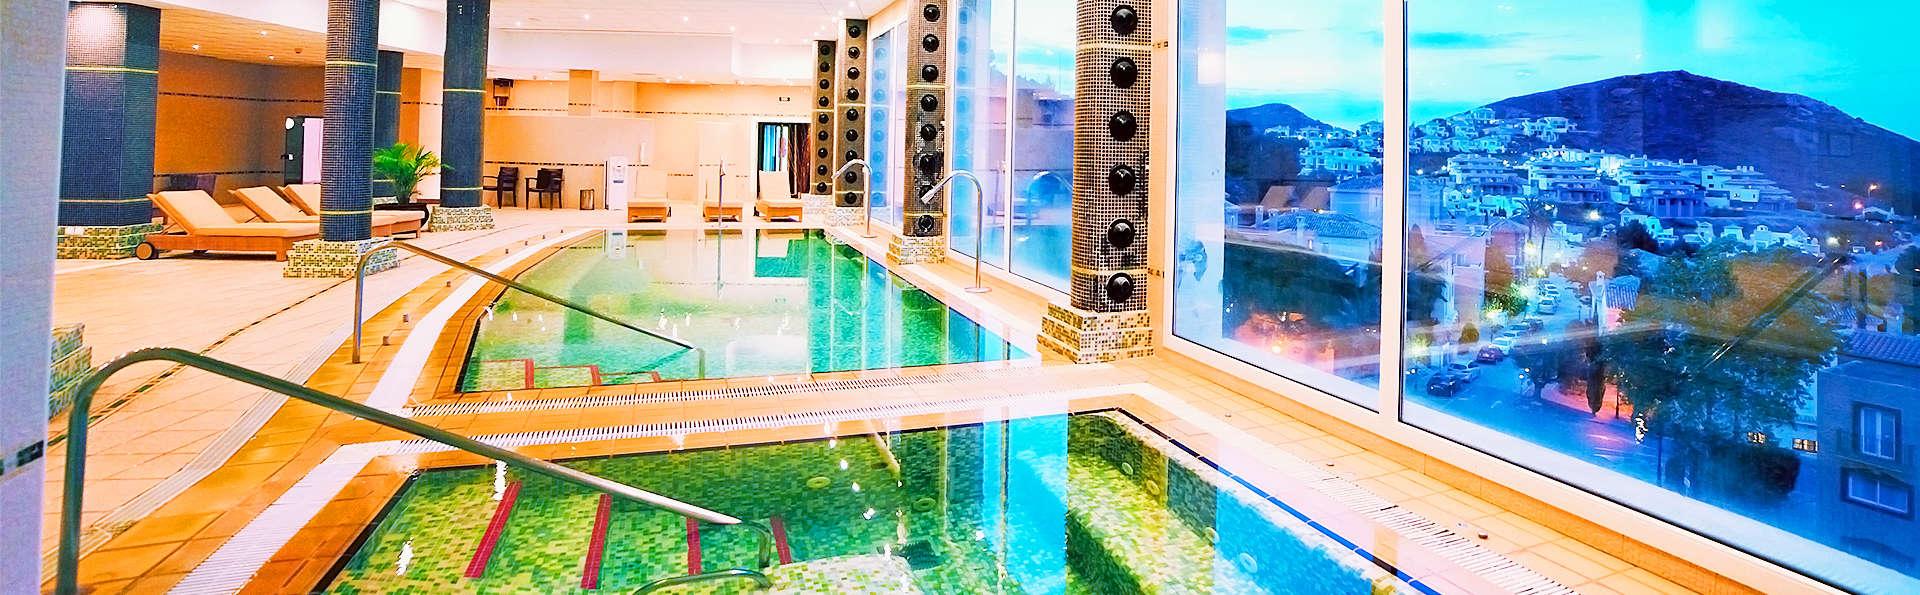 La Manga Club Hotel Príncipe Felipe - EDIT_7_interiores.jpg